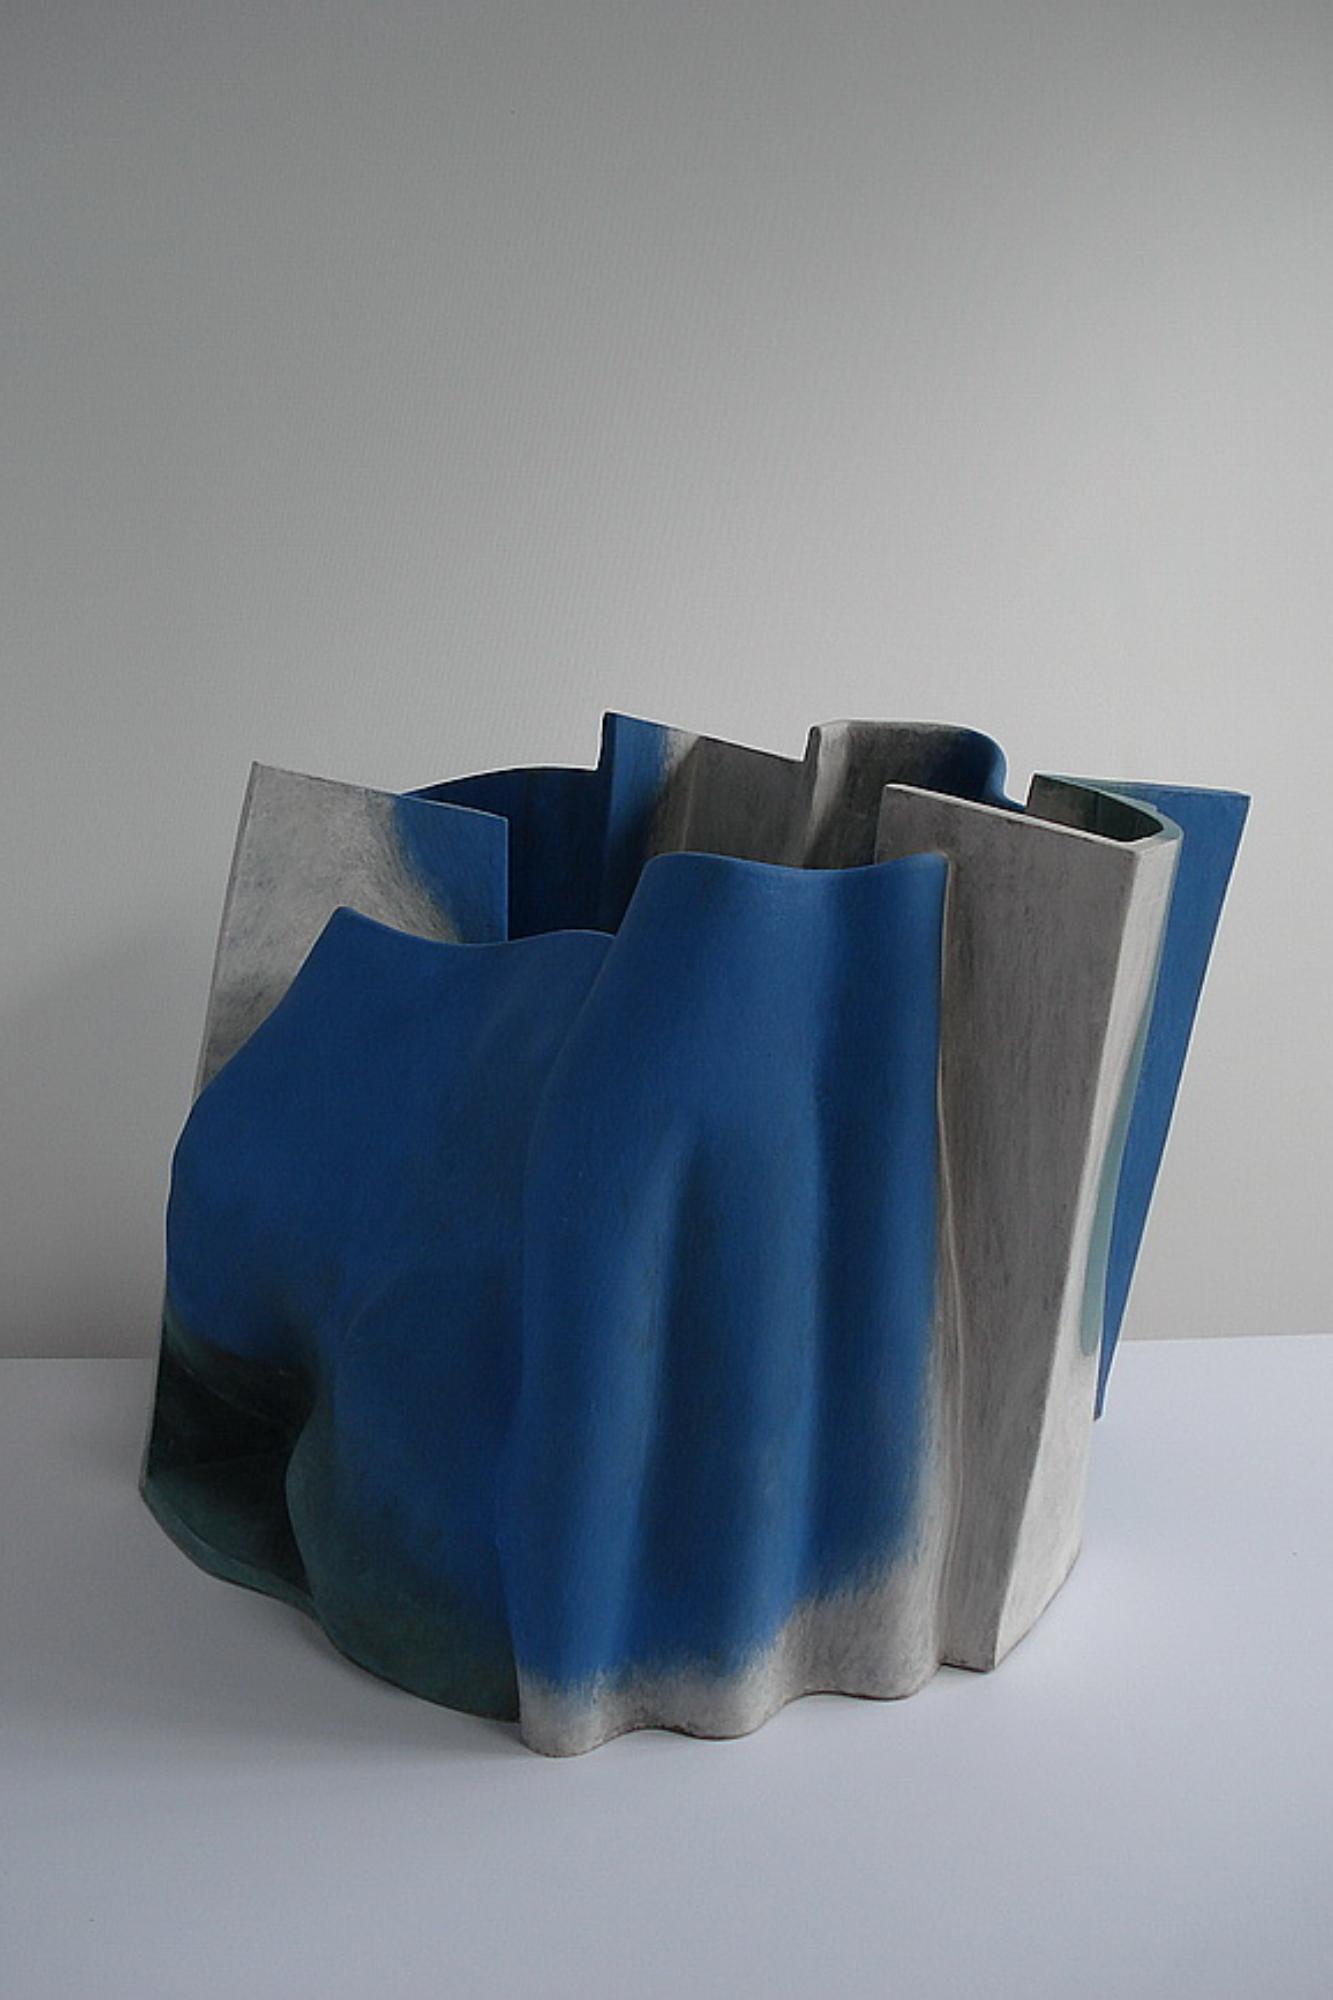 Sastrugi, 2007, 31cm high